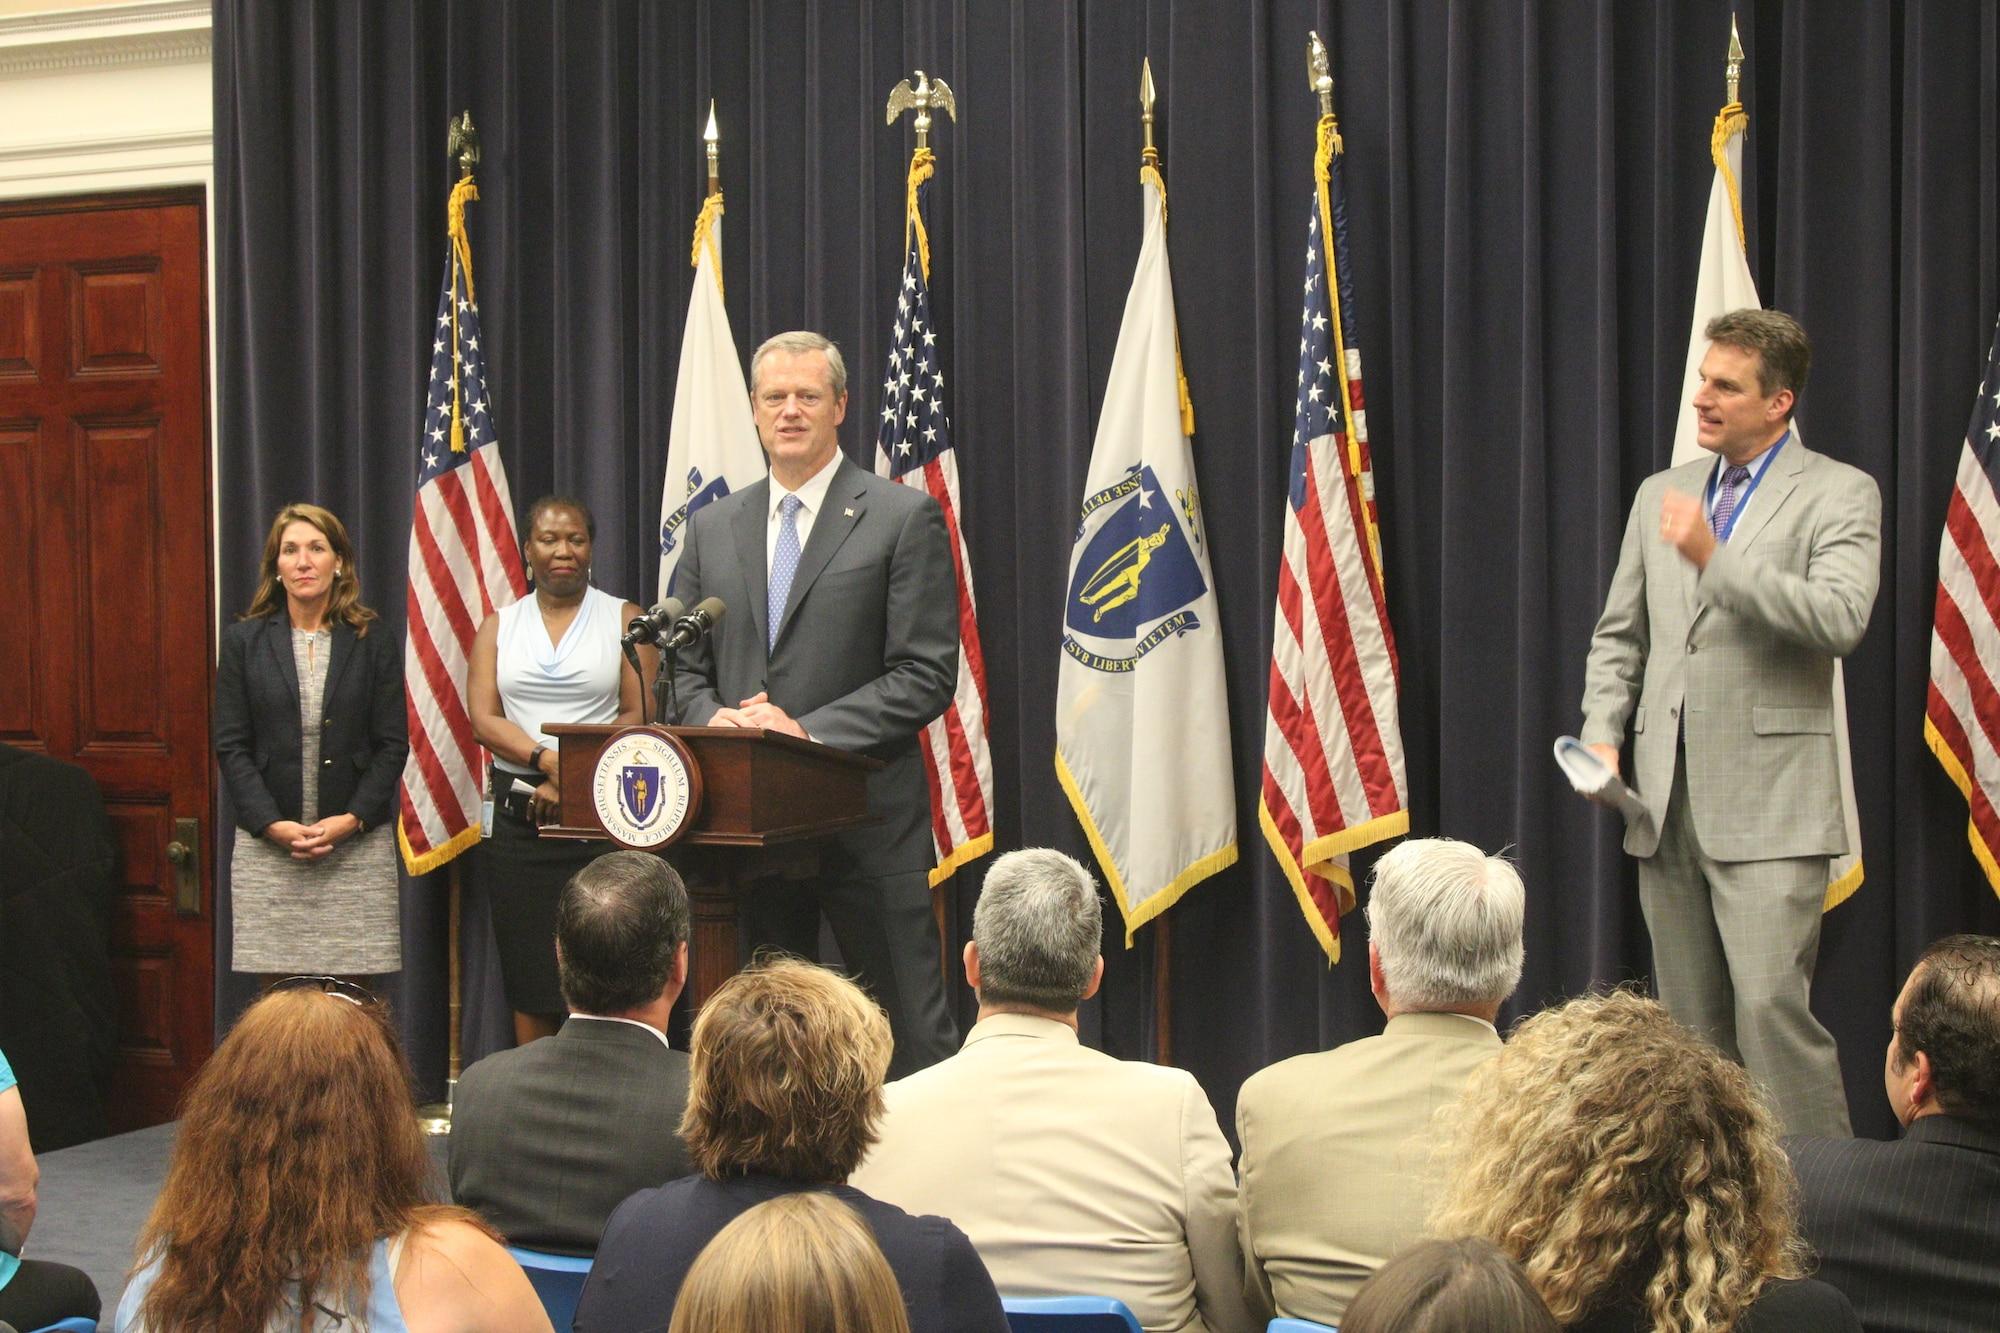 Governor Baker announces Community Development Block Grants during Statehouse event in Boston.